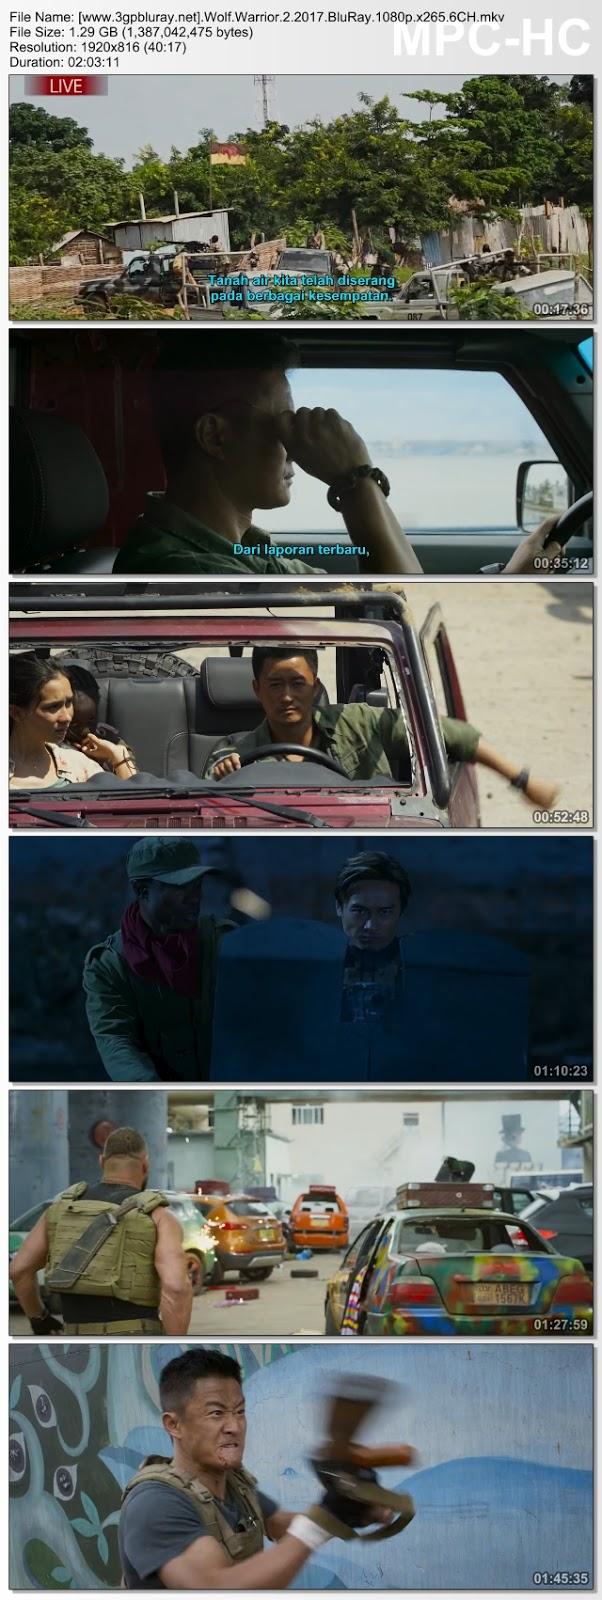 Screenshots Download Film Gratis Hardsub Indo Zhan lang II (2017) BluRay 480p MP4 Subtitle Bahasa Indonesia 3GP